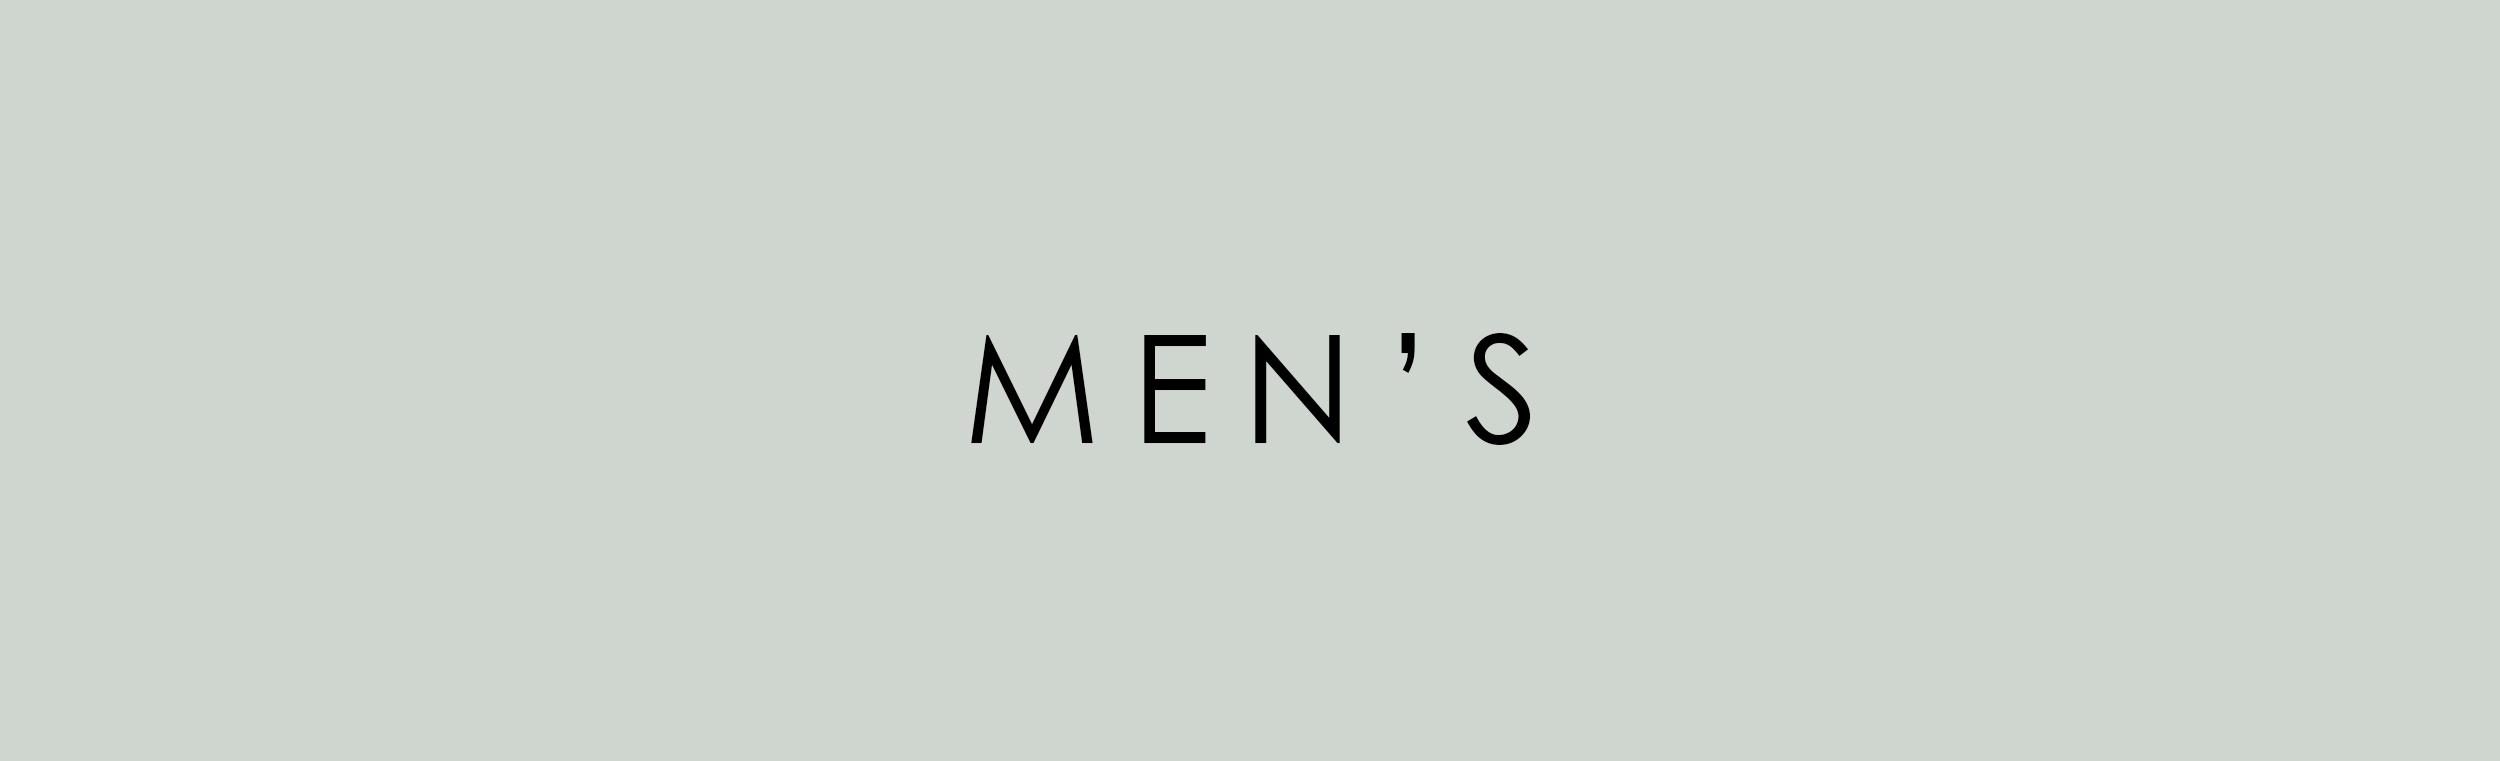 Men's Button.jpg